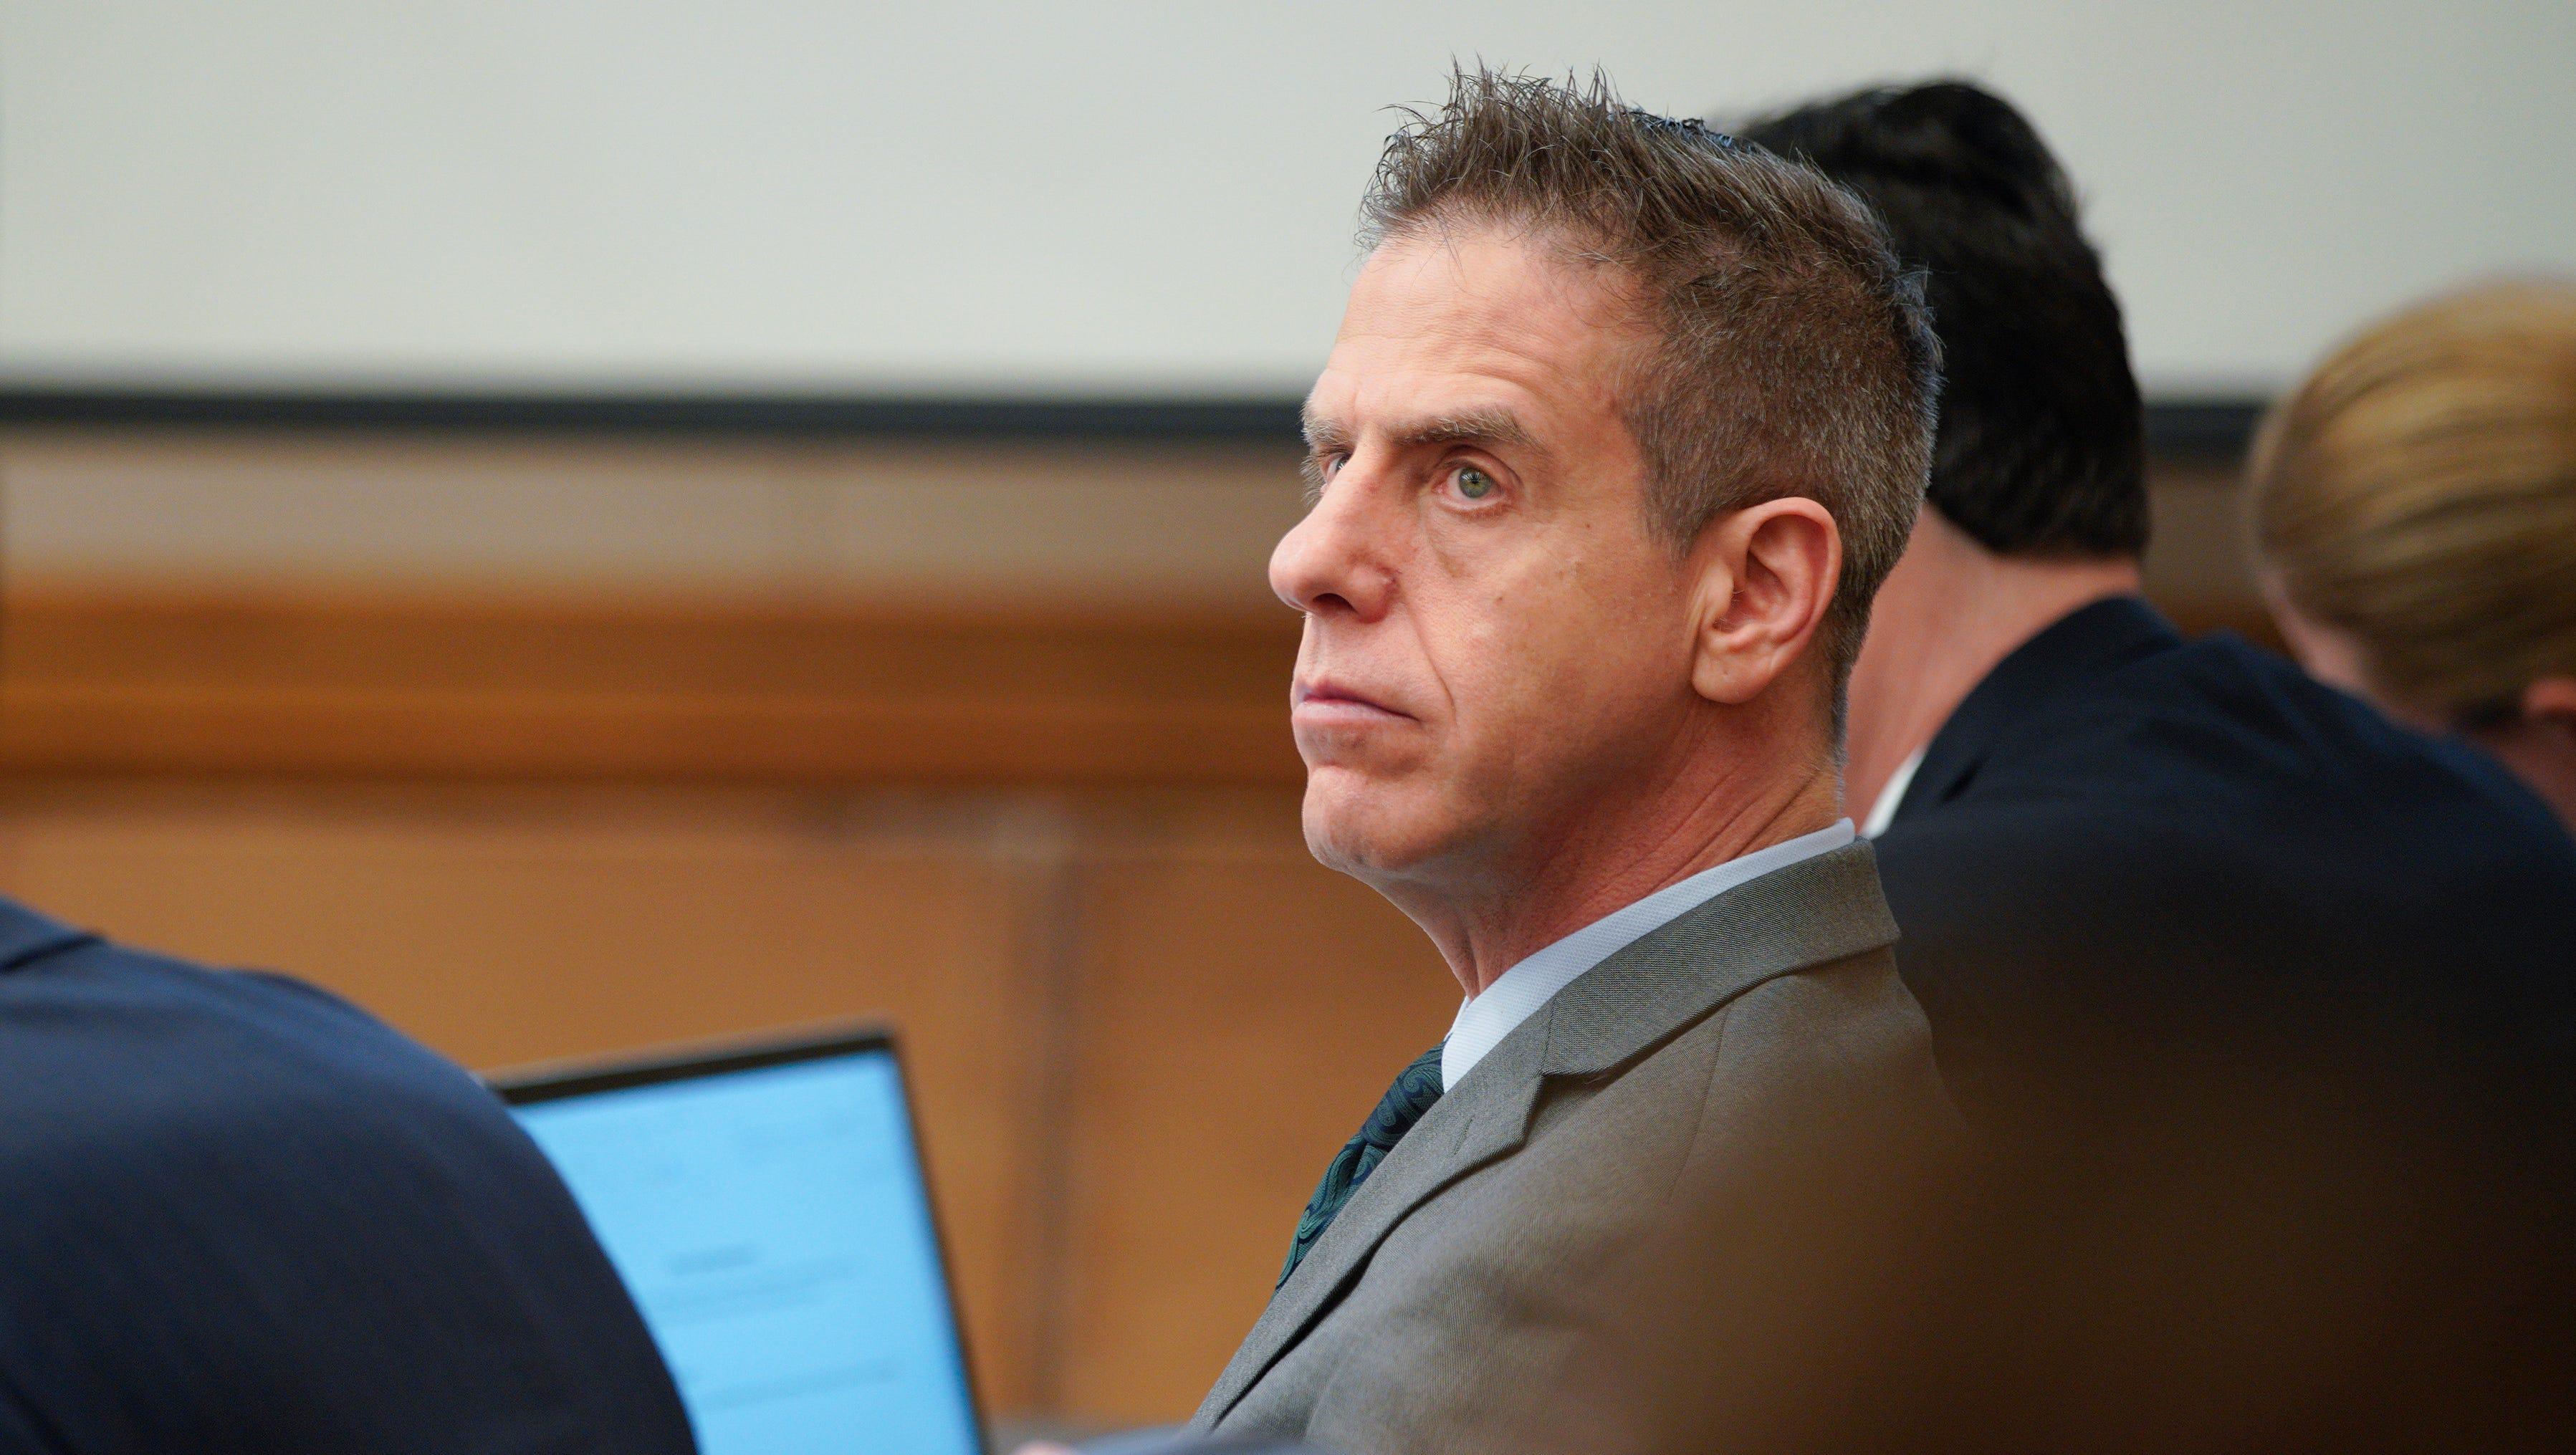 Rebecca Zahau Death Adam Shacknai Found Responsible For Hanging